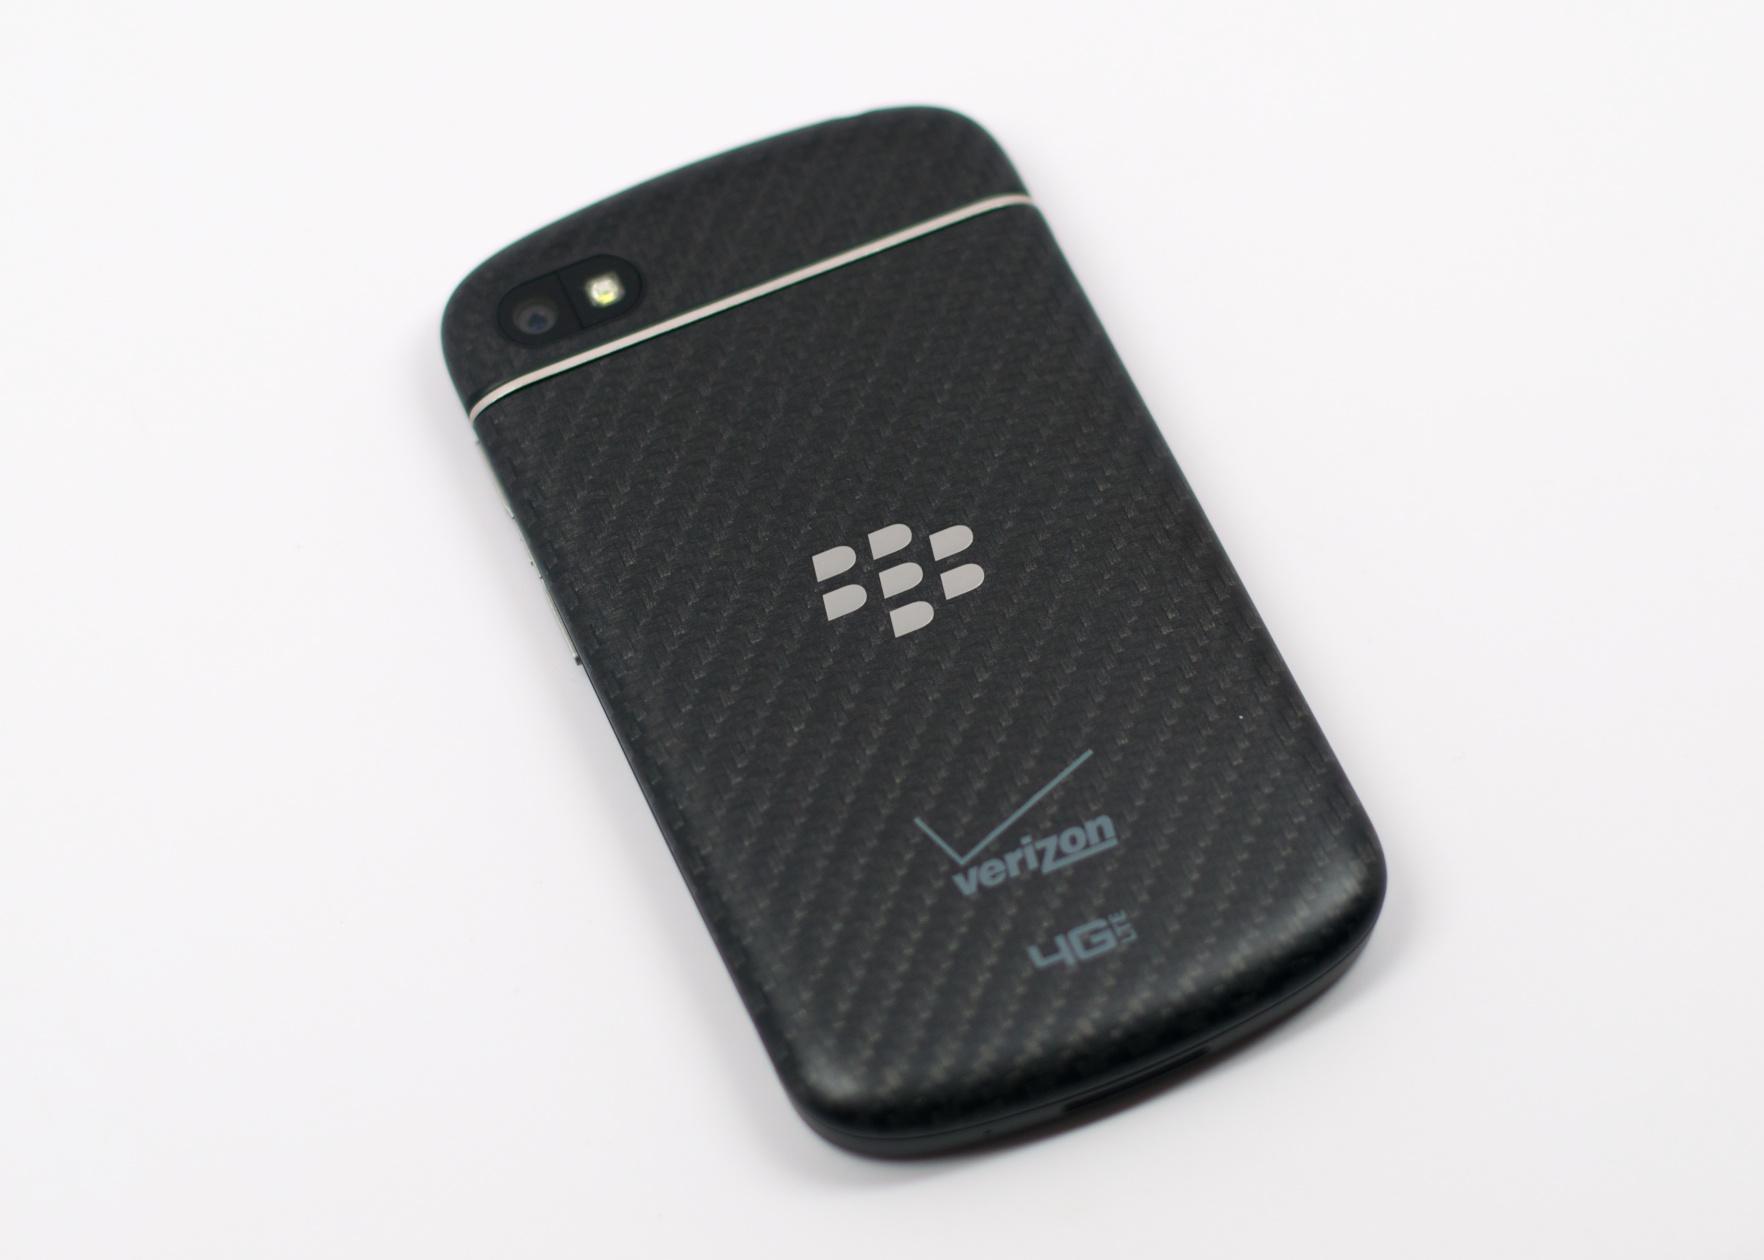 Verizon blackberry q10 review blackberry q10 review 002 ccuart Gallery